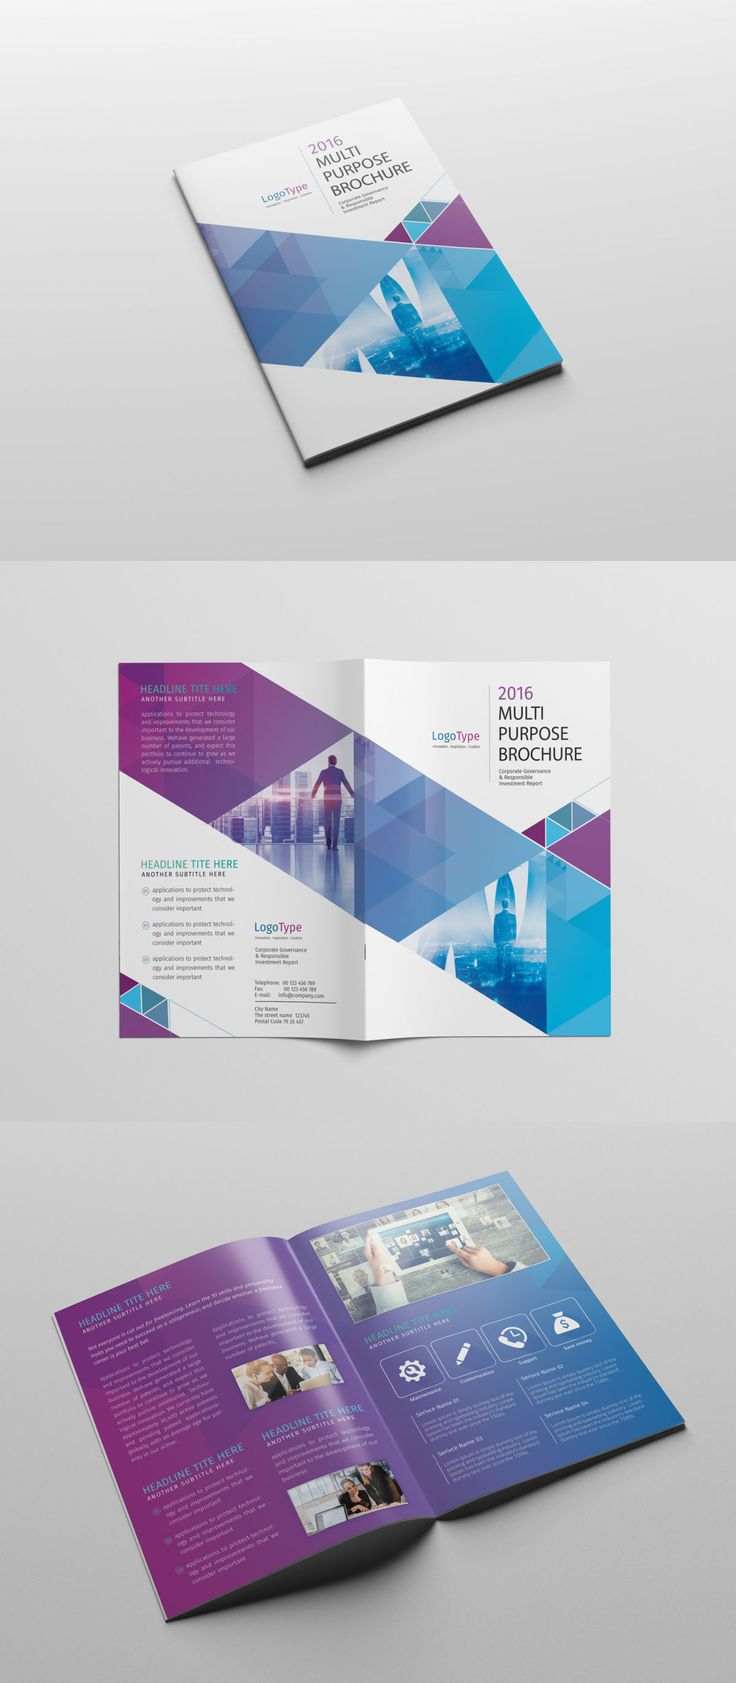 must see brochure cover pins portfolio design portfolio abstract bi fold brochure template psd